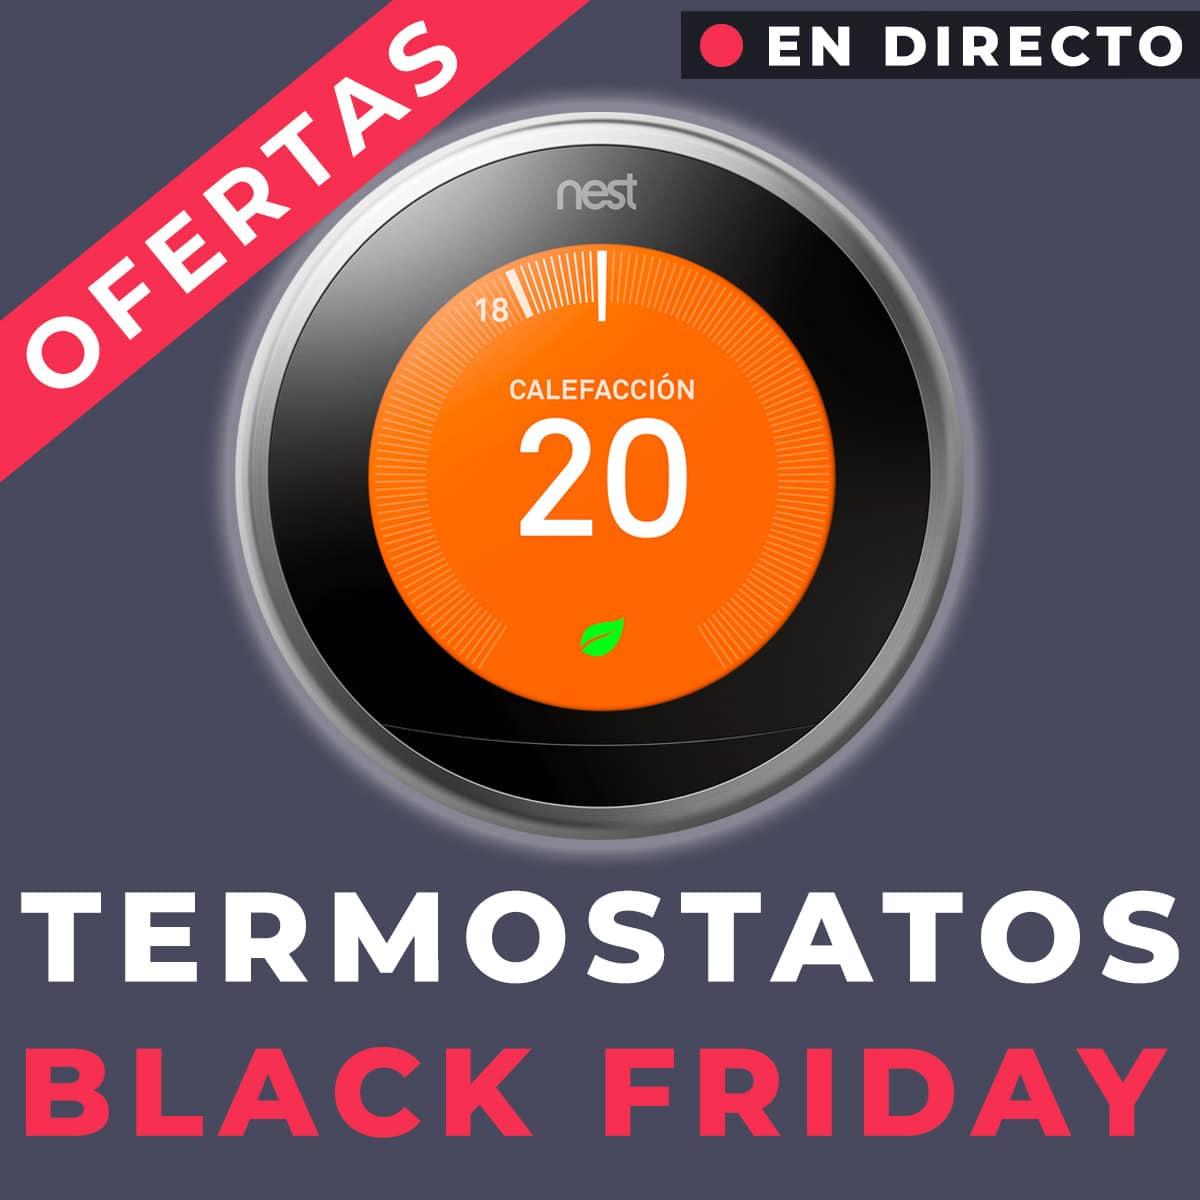 termostatos black friday ofertas